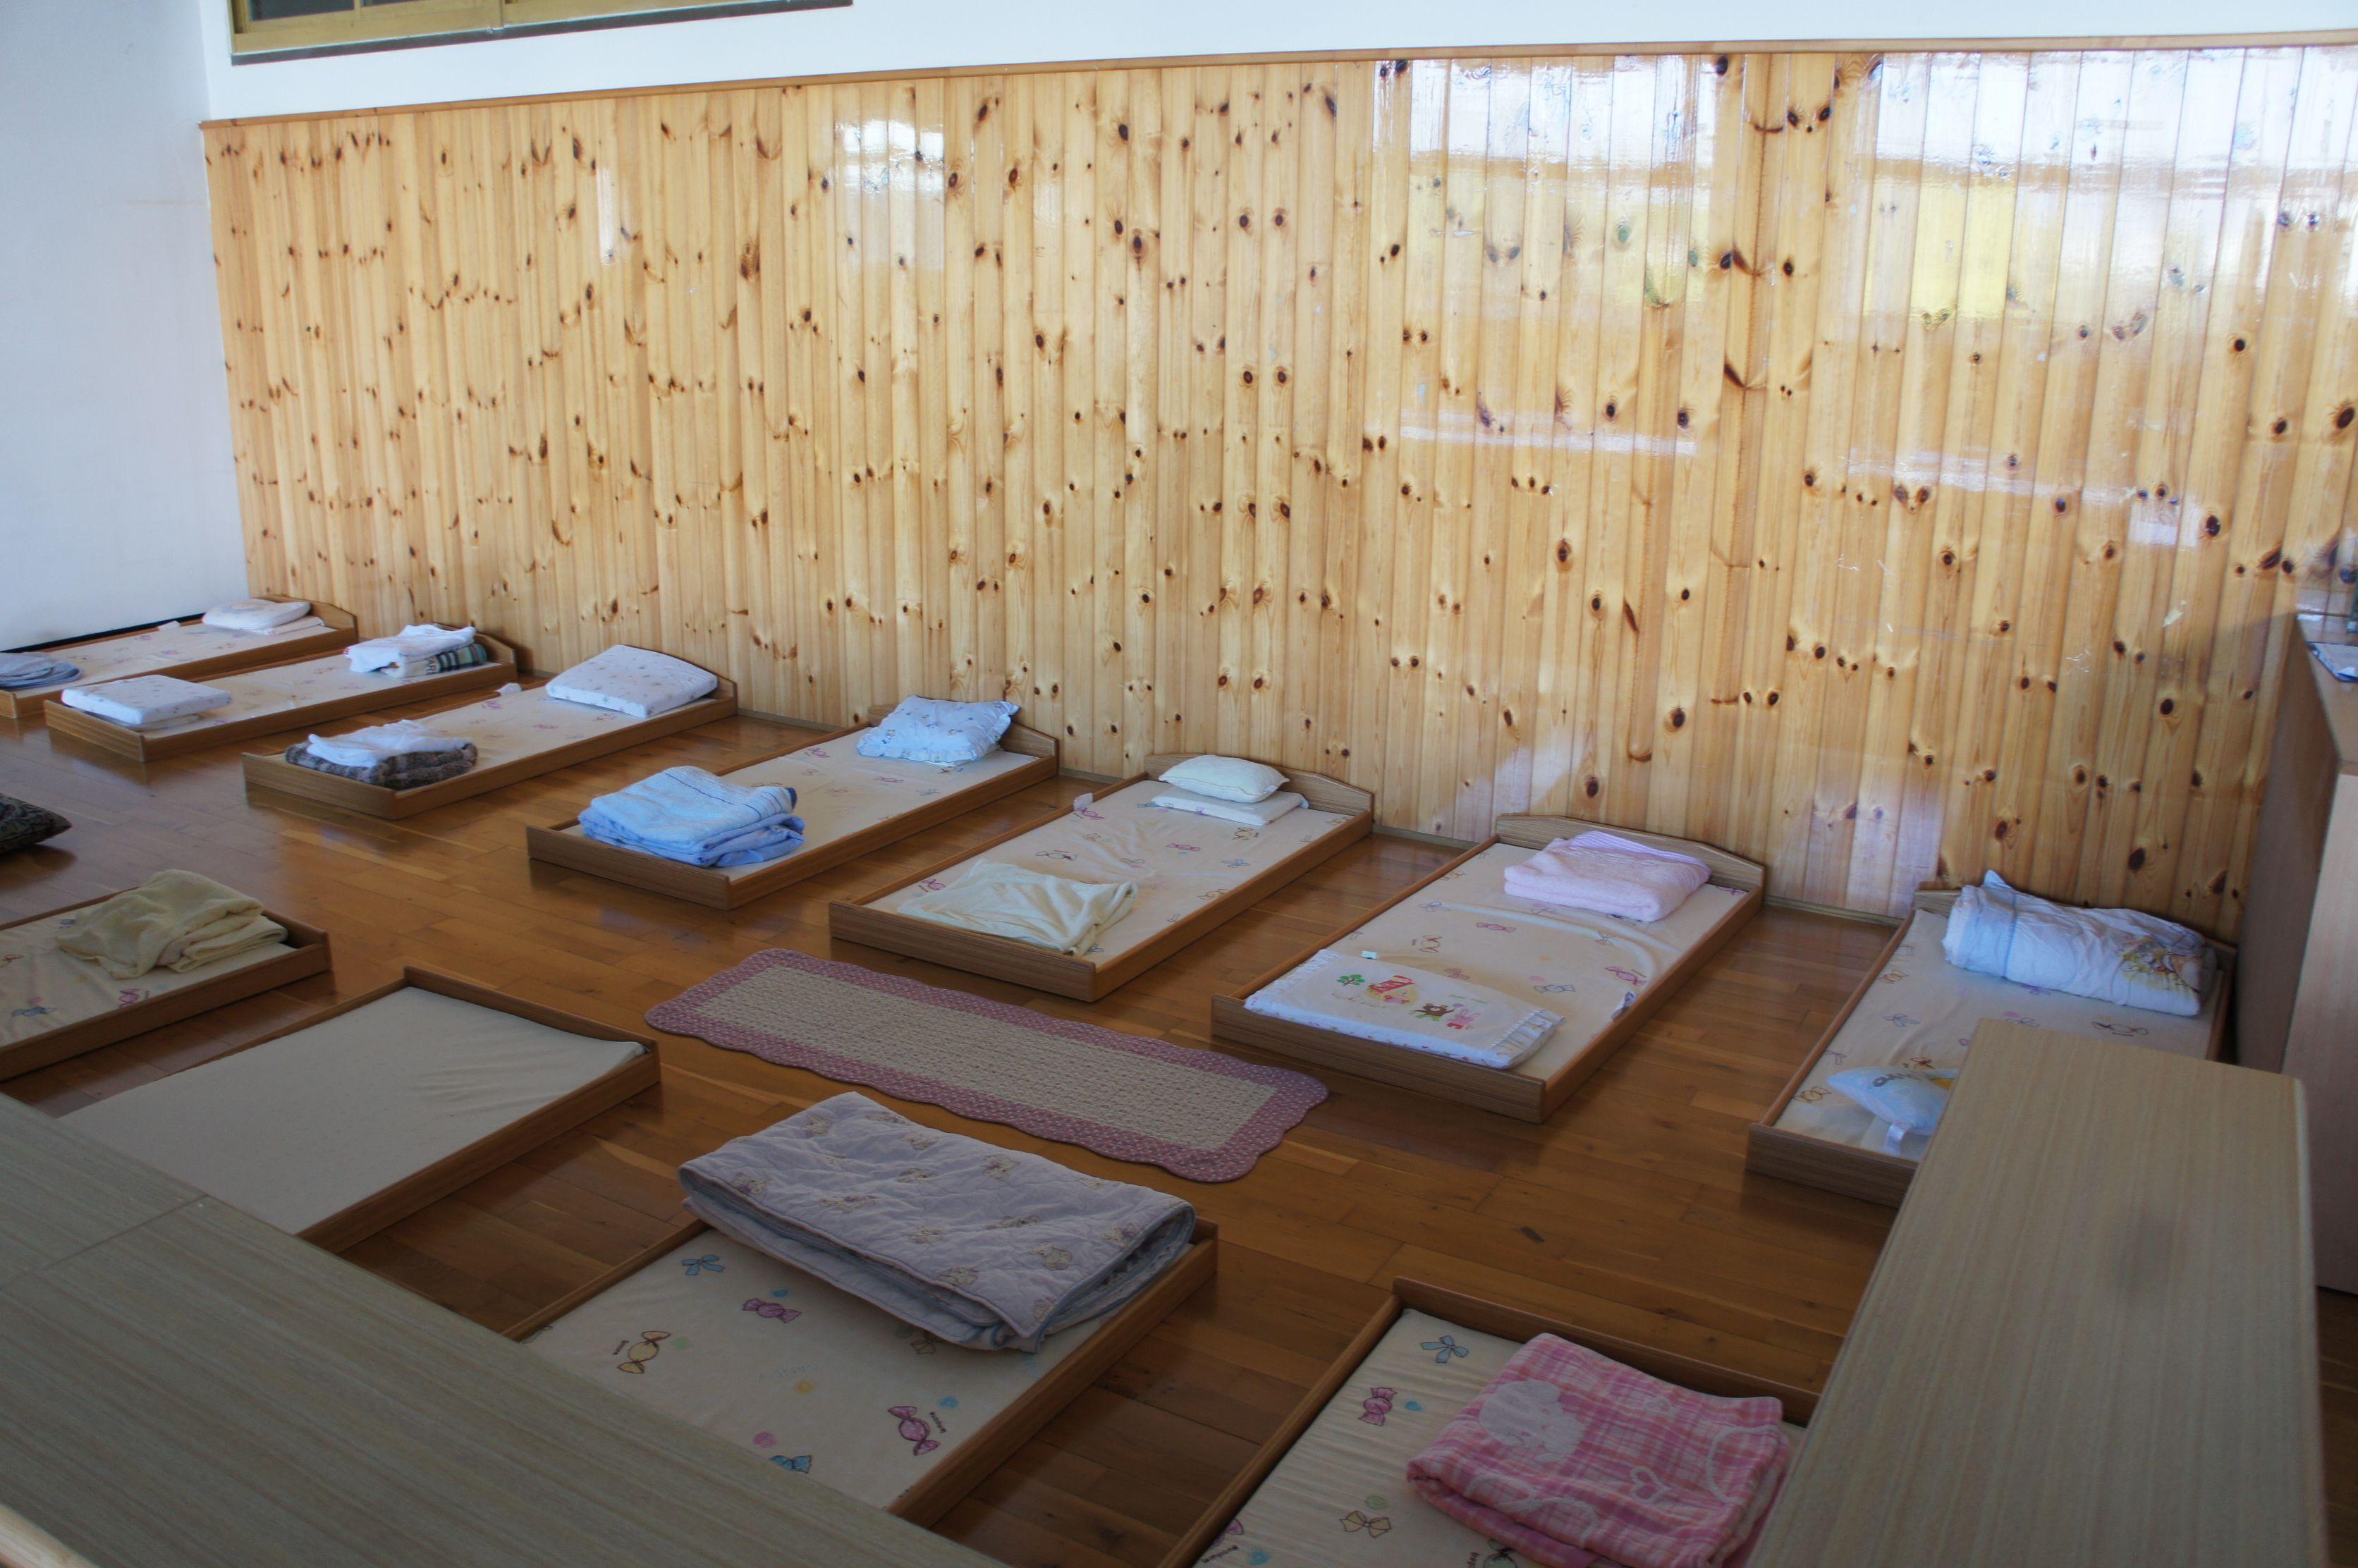 Toddler Classroom Design Ideas ~ Toddler community nap area montessori north